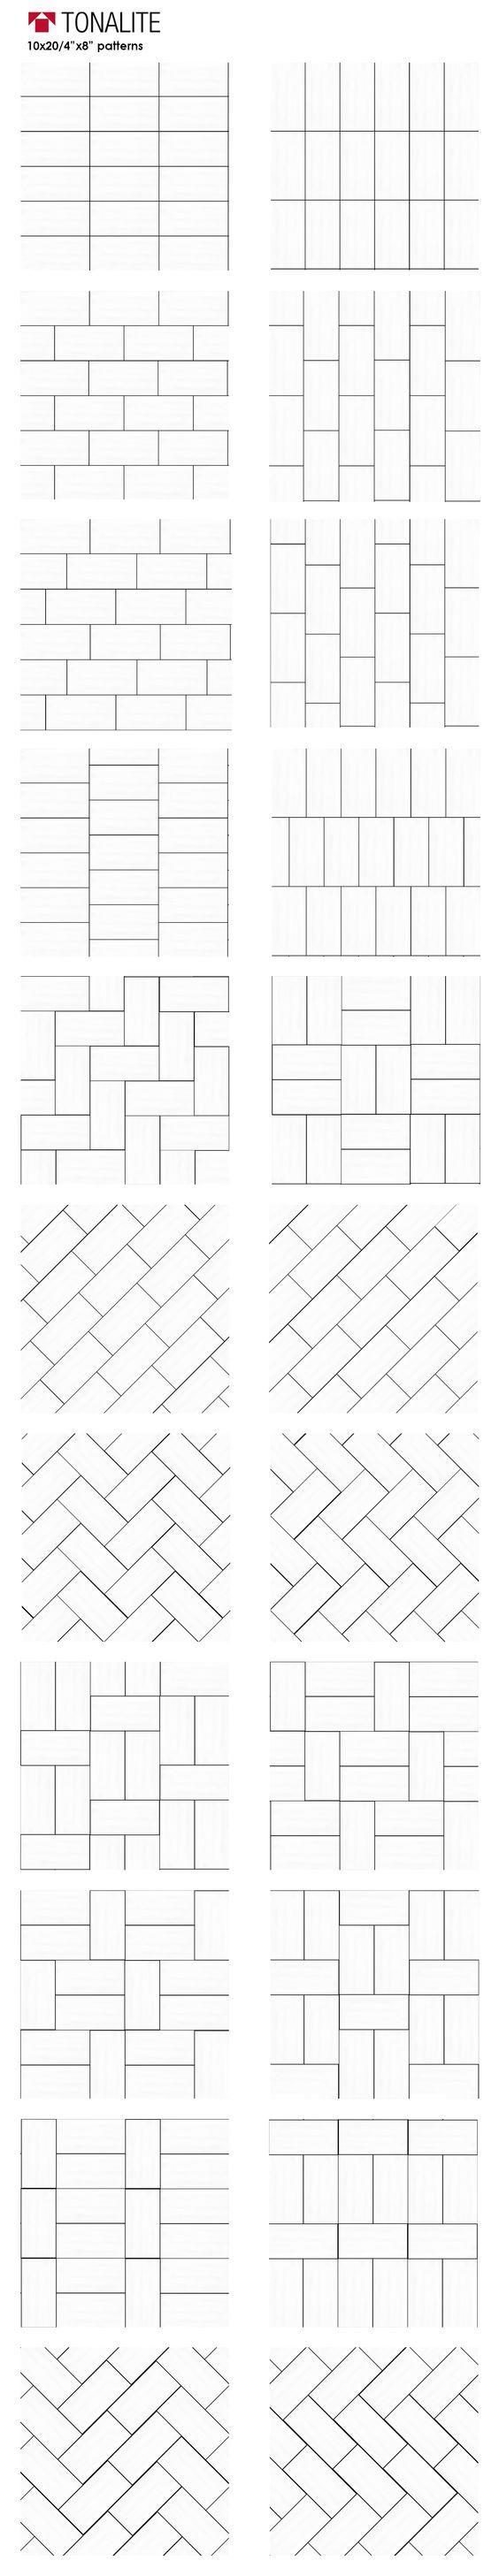 "Tonalite 20 creative ways to lay 4""x8"" tile. subway tiles, metro tiles, backsplash, piastrelle, layout, patterns, schemi di posa, walltiles, floortiles, pavimento, rivestimento, ceramica, ceramiche, piastrelle, made in italy with passion, ceramics of italy, italian tiles, italian style, home, design, homedesign, homedecor, interiordesign, arredamento, architettura, casa, architetto:"